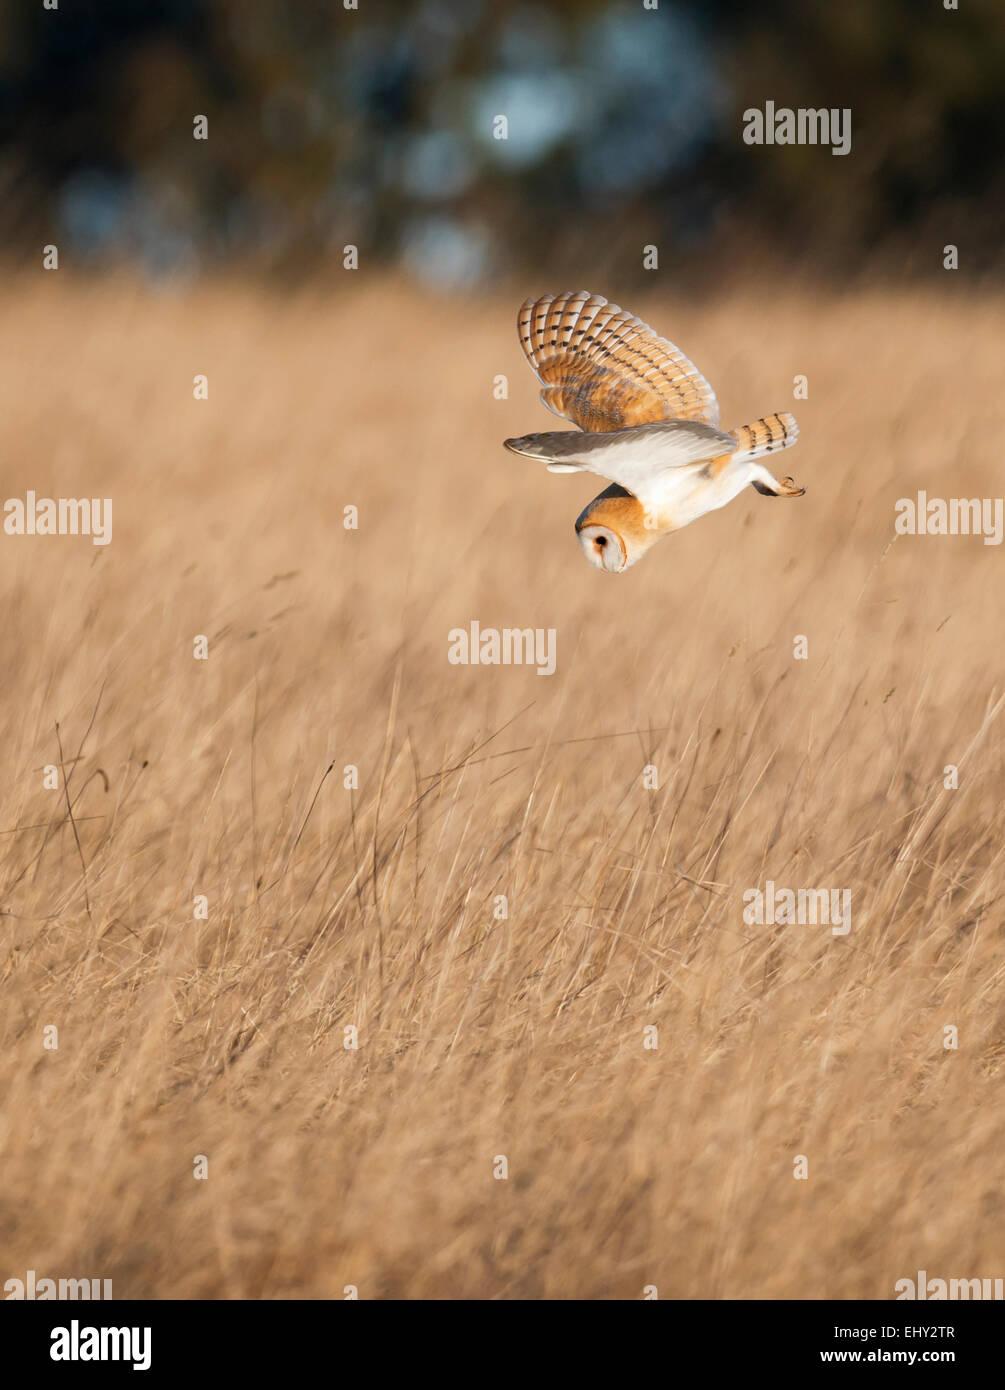 Wild Barn Owl Tyto Alba diving for prey in golden morning sunlight over Cotswolds grasslands - Stock Image